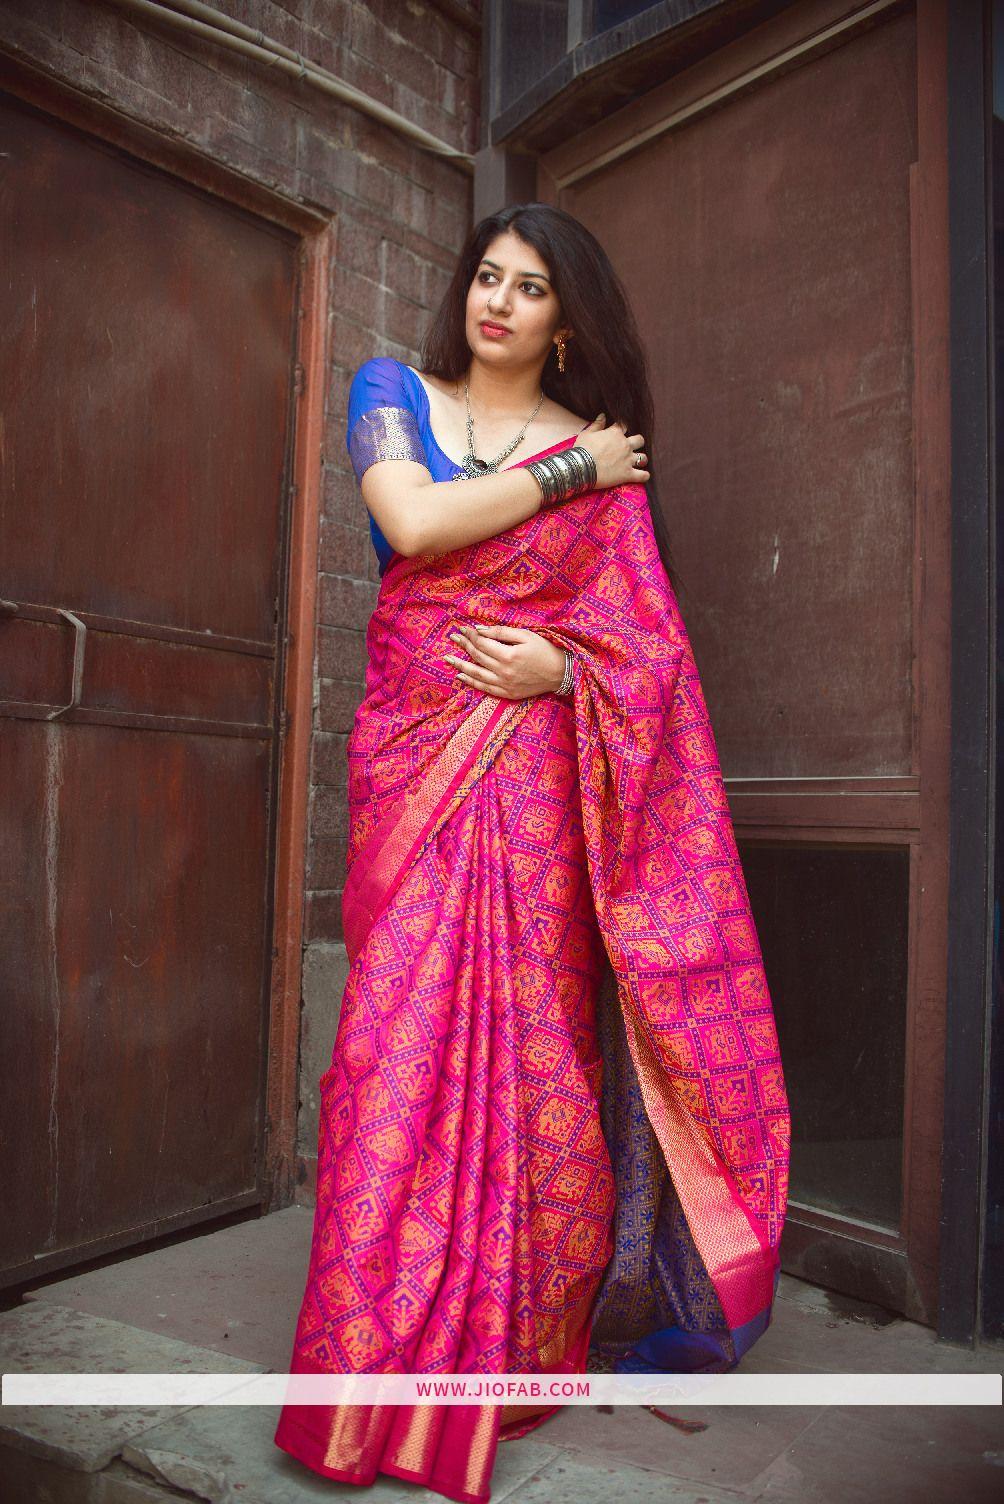 5cc3633aa Buy Rani Pink Patola Silk Saree India With Best Price In India - Jiofab